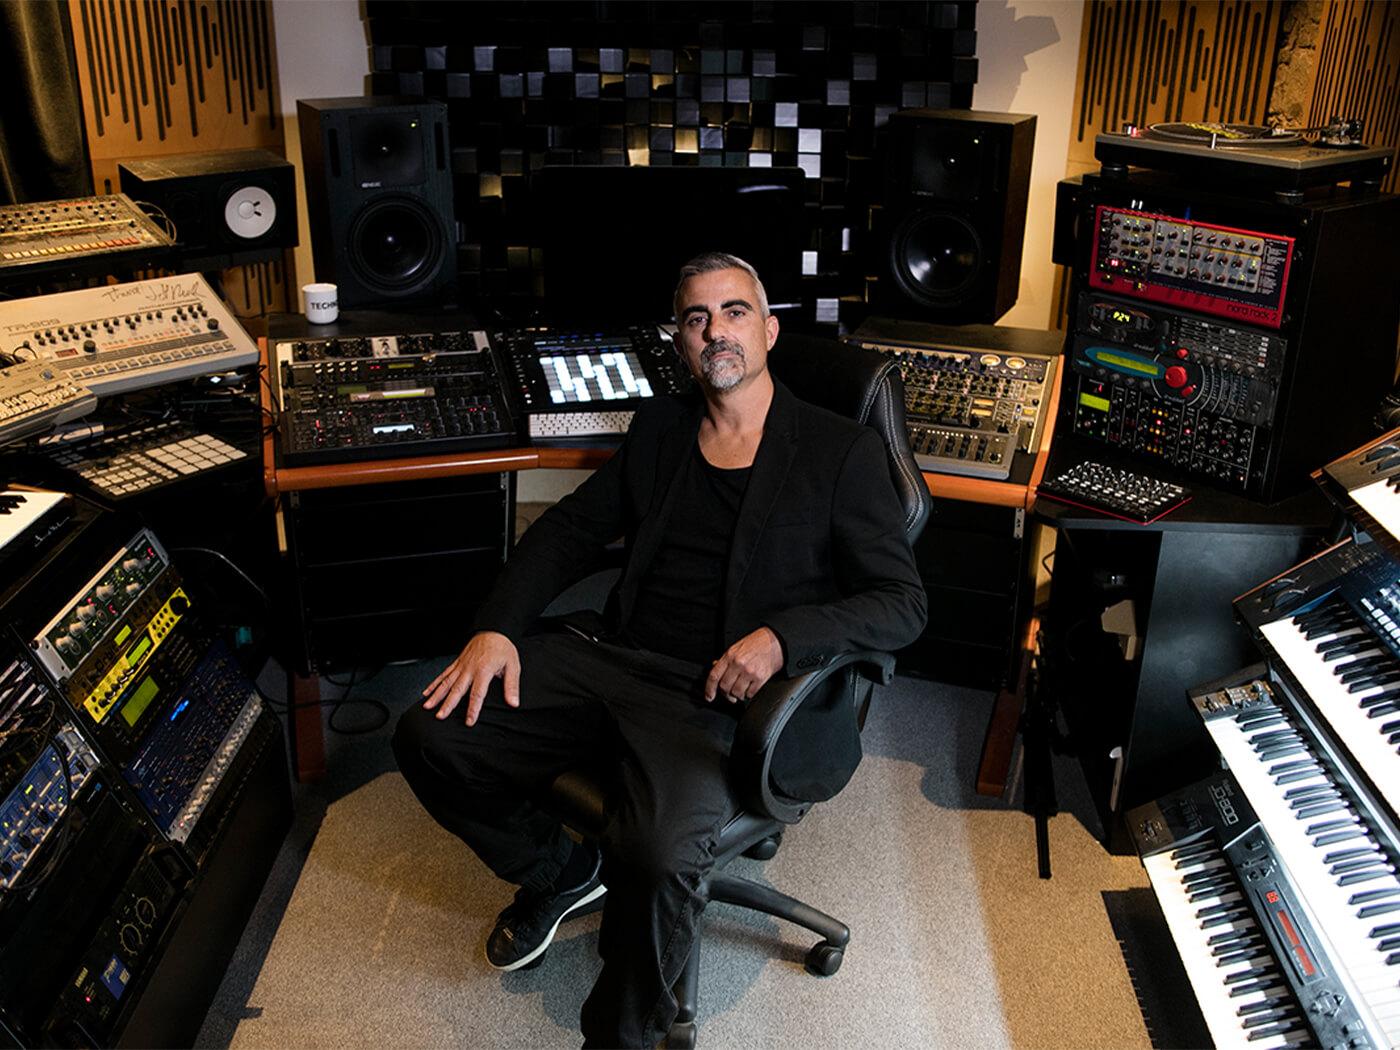 Show Off Your Studio: Techno veteran Gaetano Parisio's radiant rhythm room - MusicTech